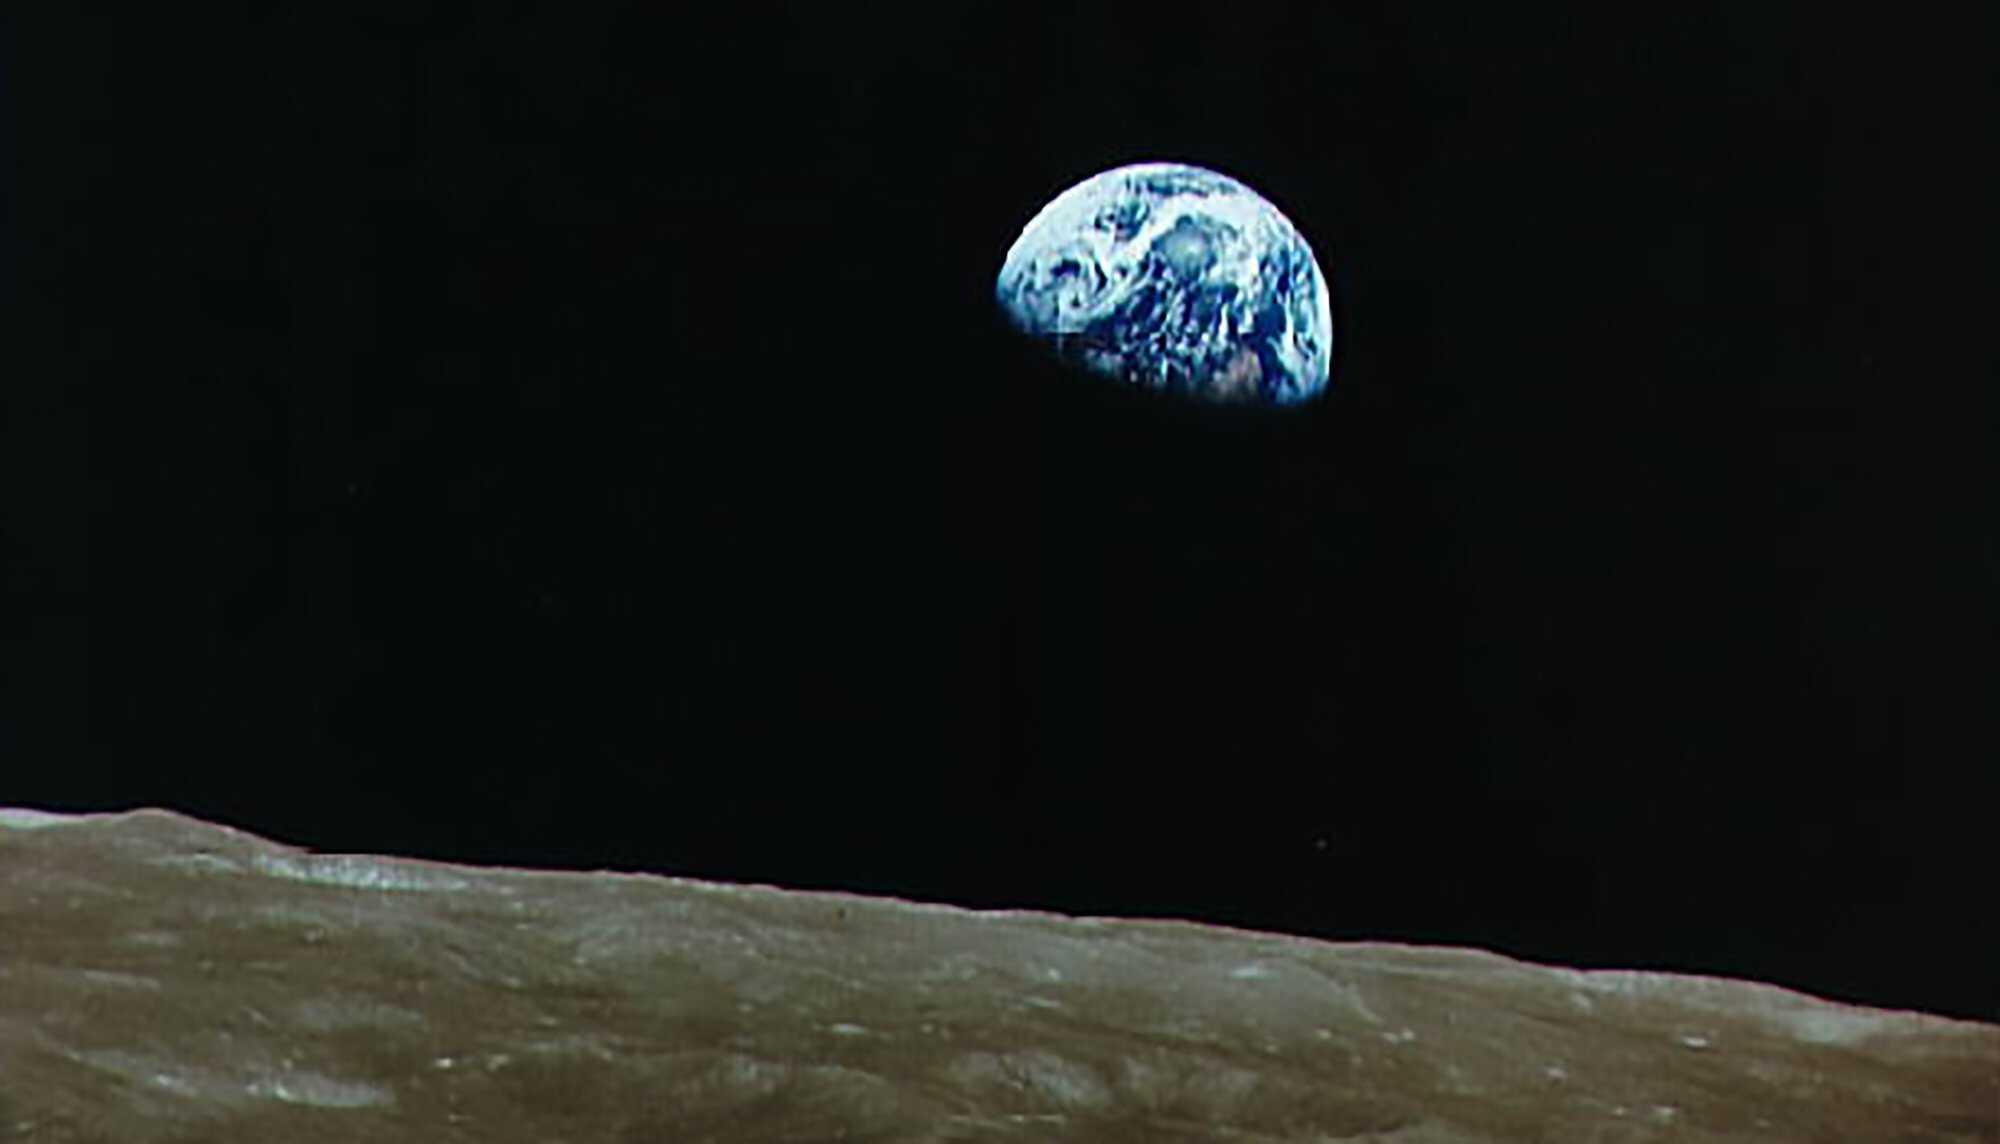 Moon-Apollo_earthrise_01.jpg